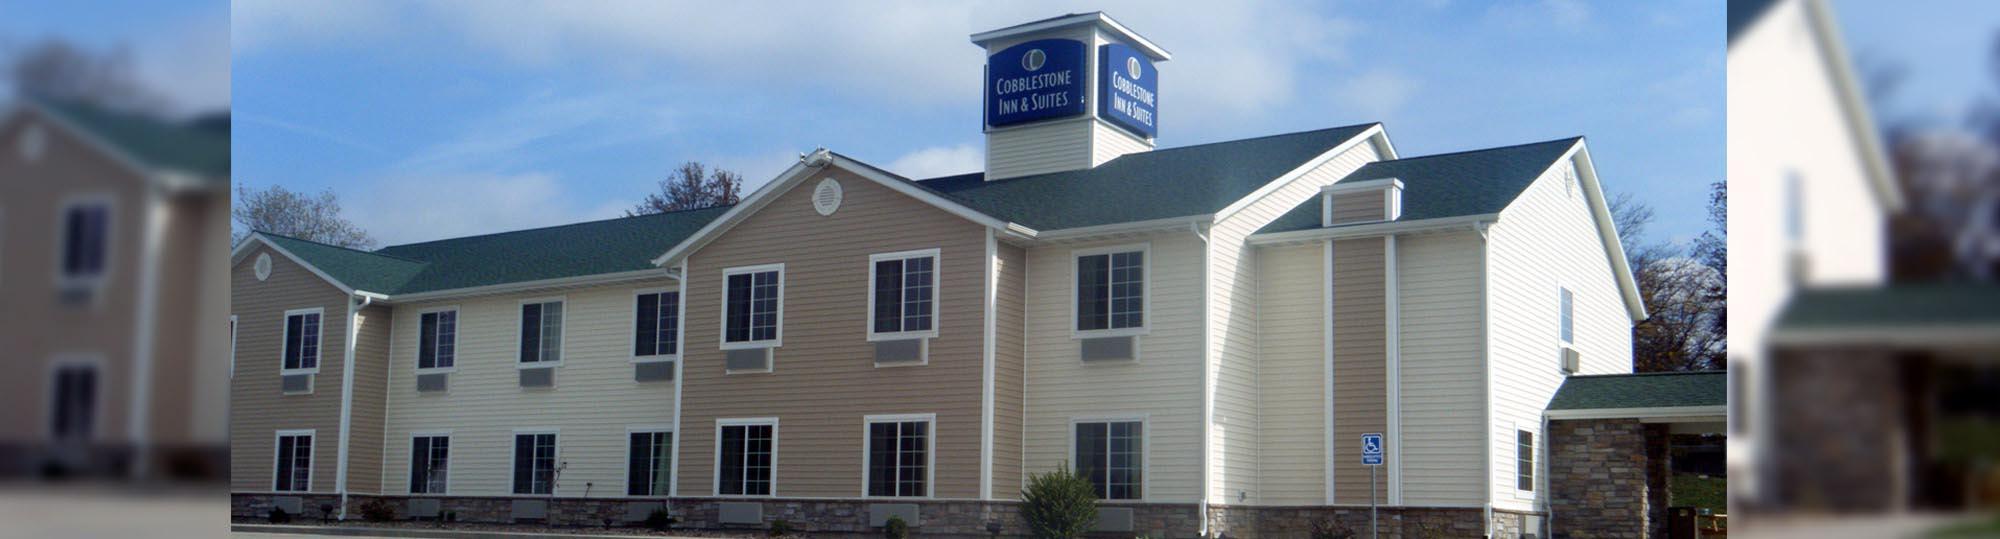 Cobblestone Inn & Suites Bloomfield